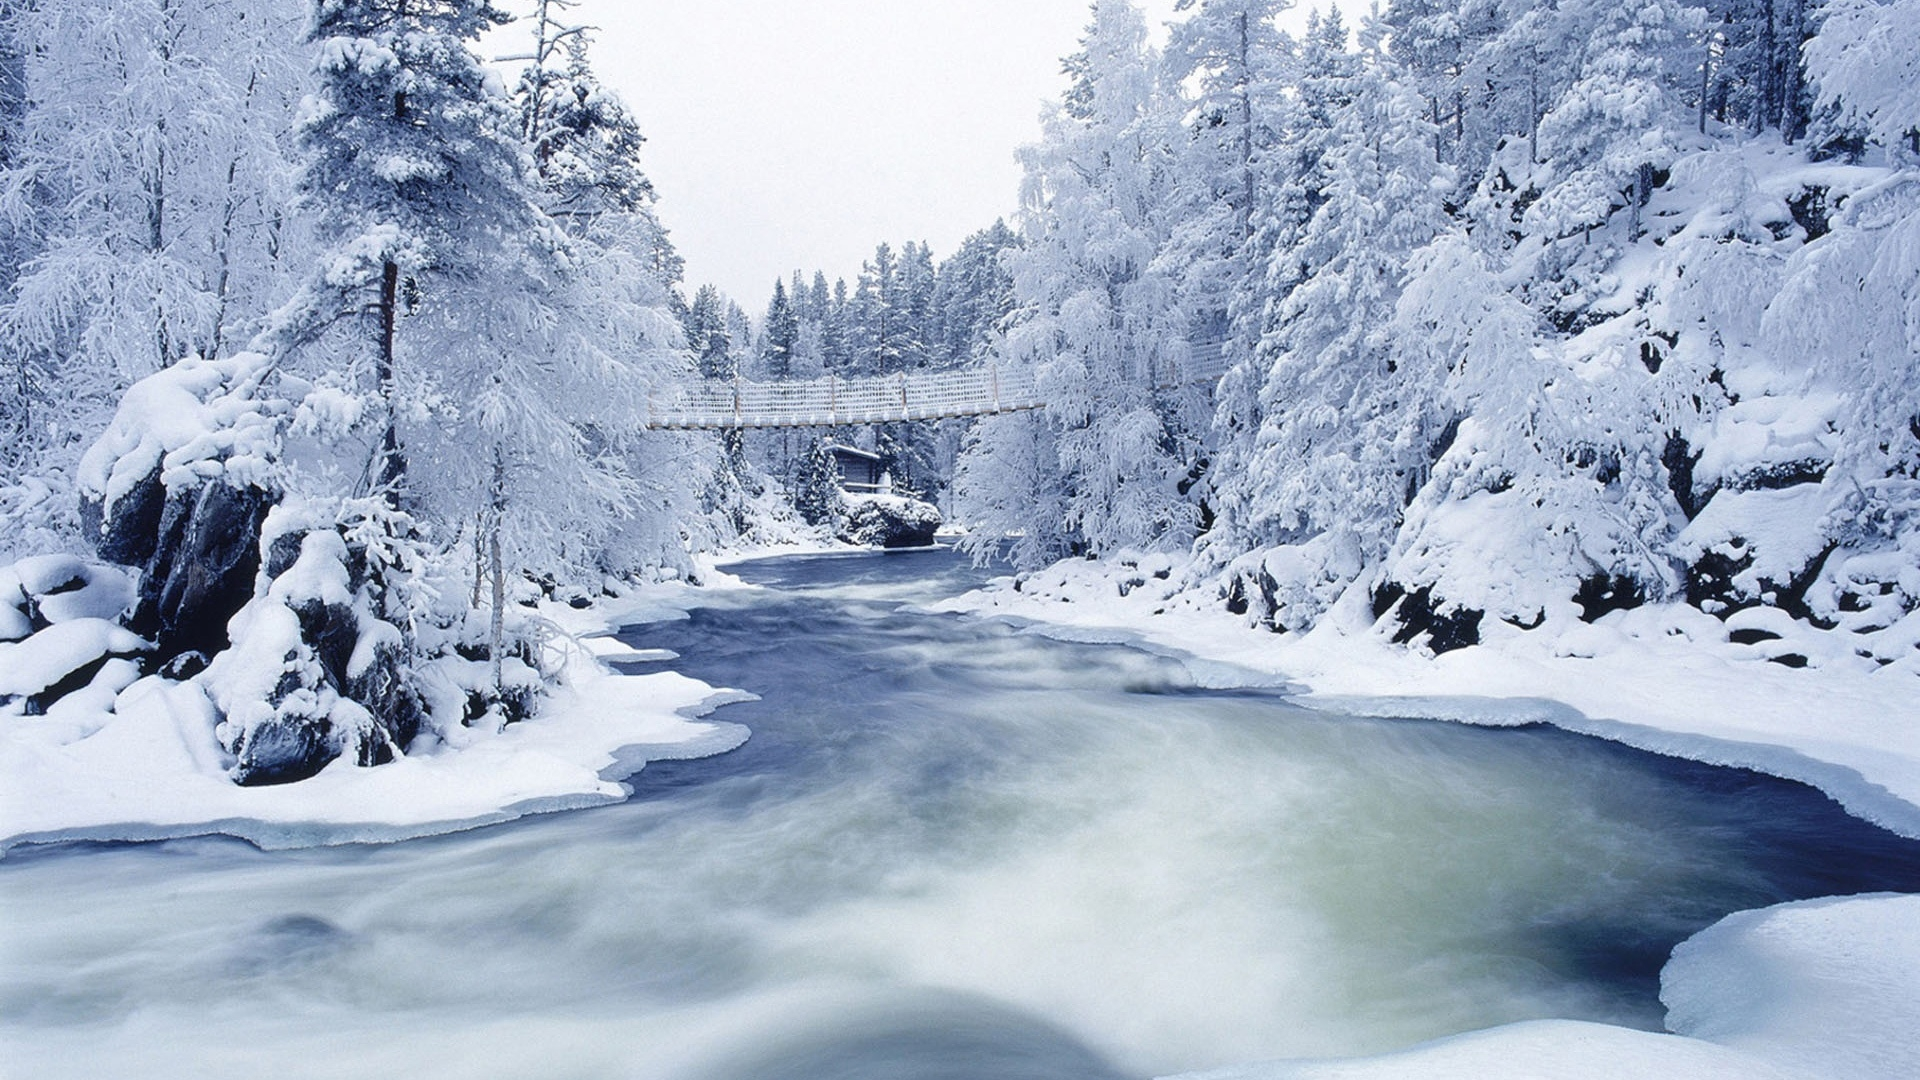 Frozen Trees River Wallpapers HD 13393 Wallpaper Wallpaper hd 1920x1080